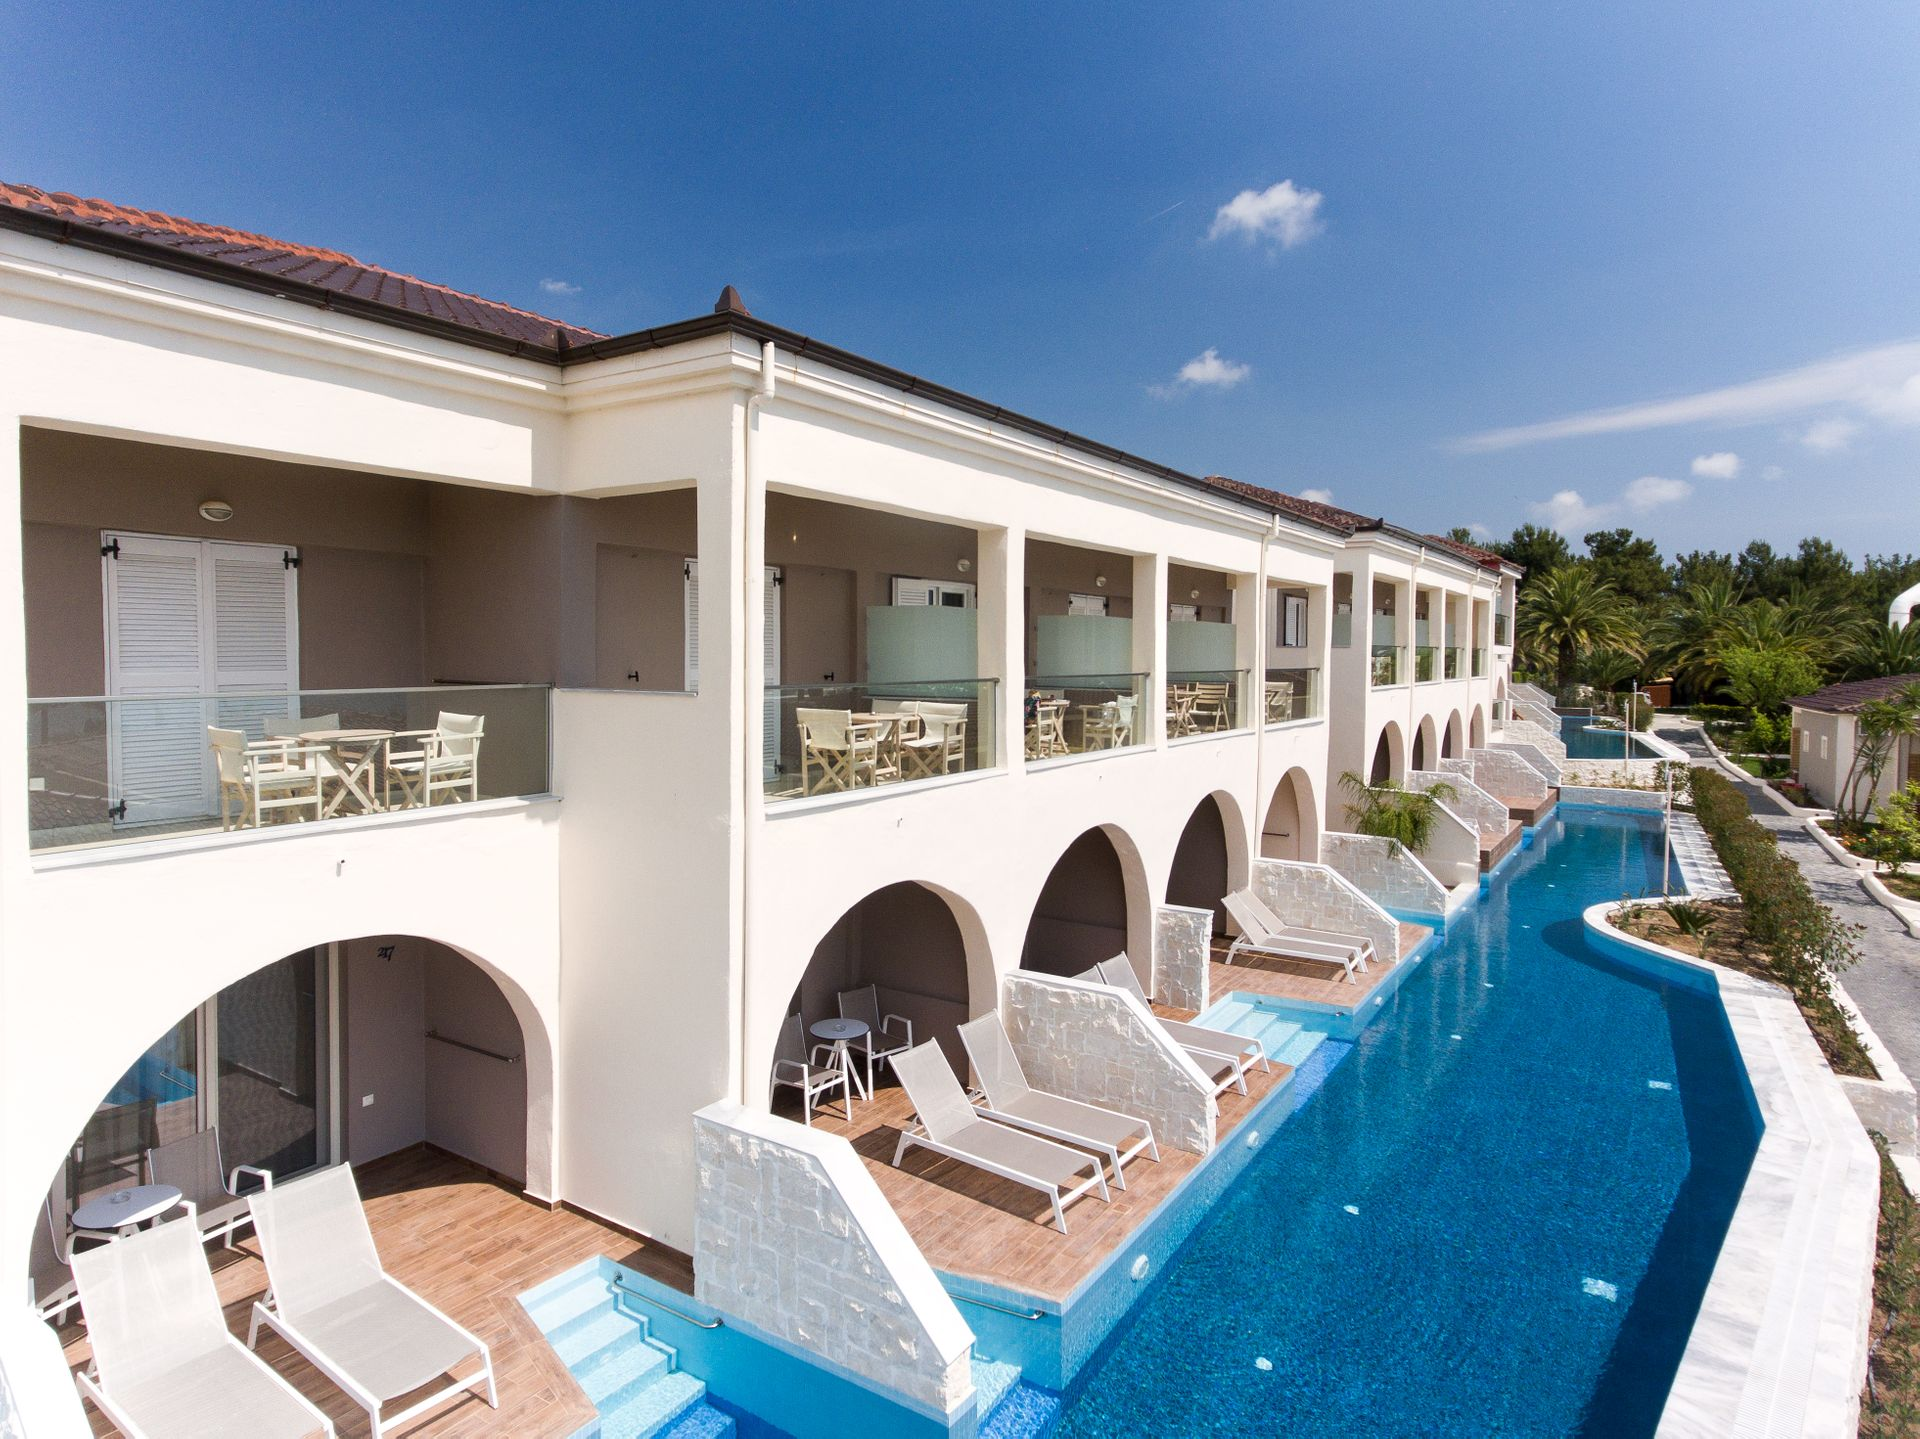 4* Alexandra Beach Thassos Spa Resort - Θασος ✦ -20% ✦ 4 Ημερες (3 Διανυκτερευσεις) ✦ 2 ατομα + 1 παιδι εως 2 ετων ✦ Ημιδιατροφη ✦ 06/09/2020 εως 30/09/2020 ✦ Free WiFi